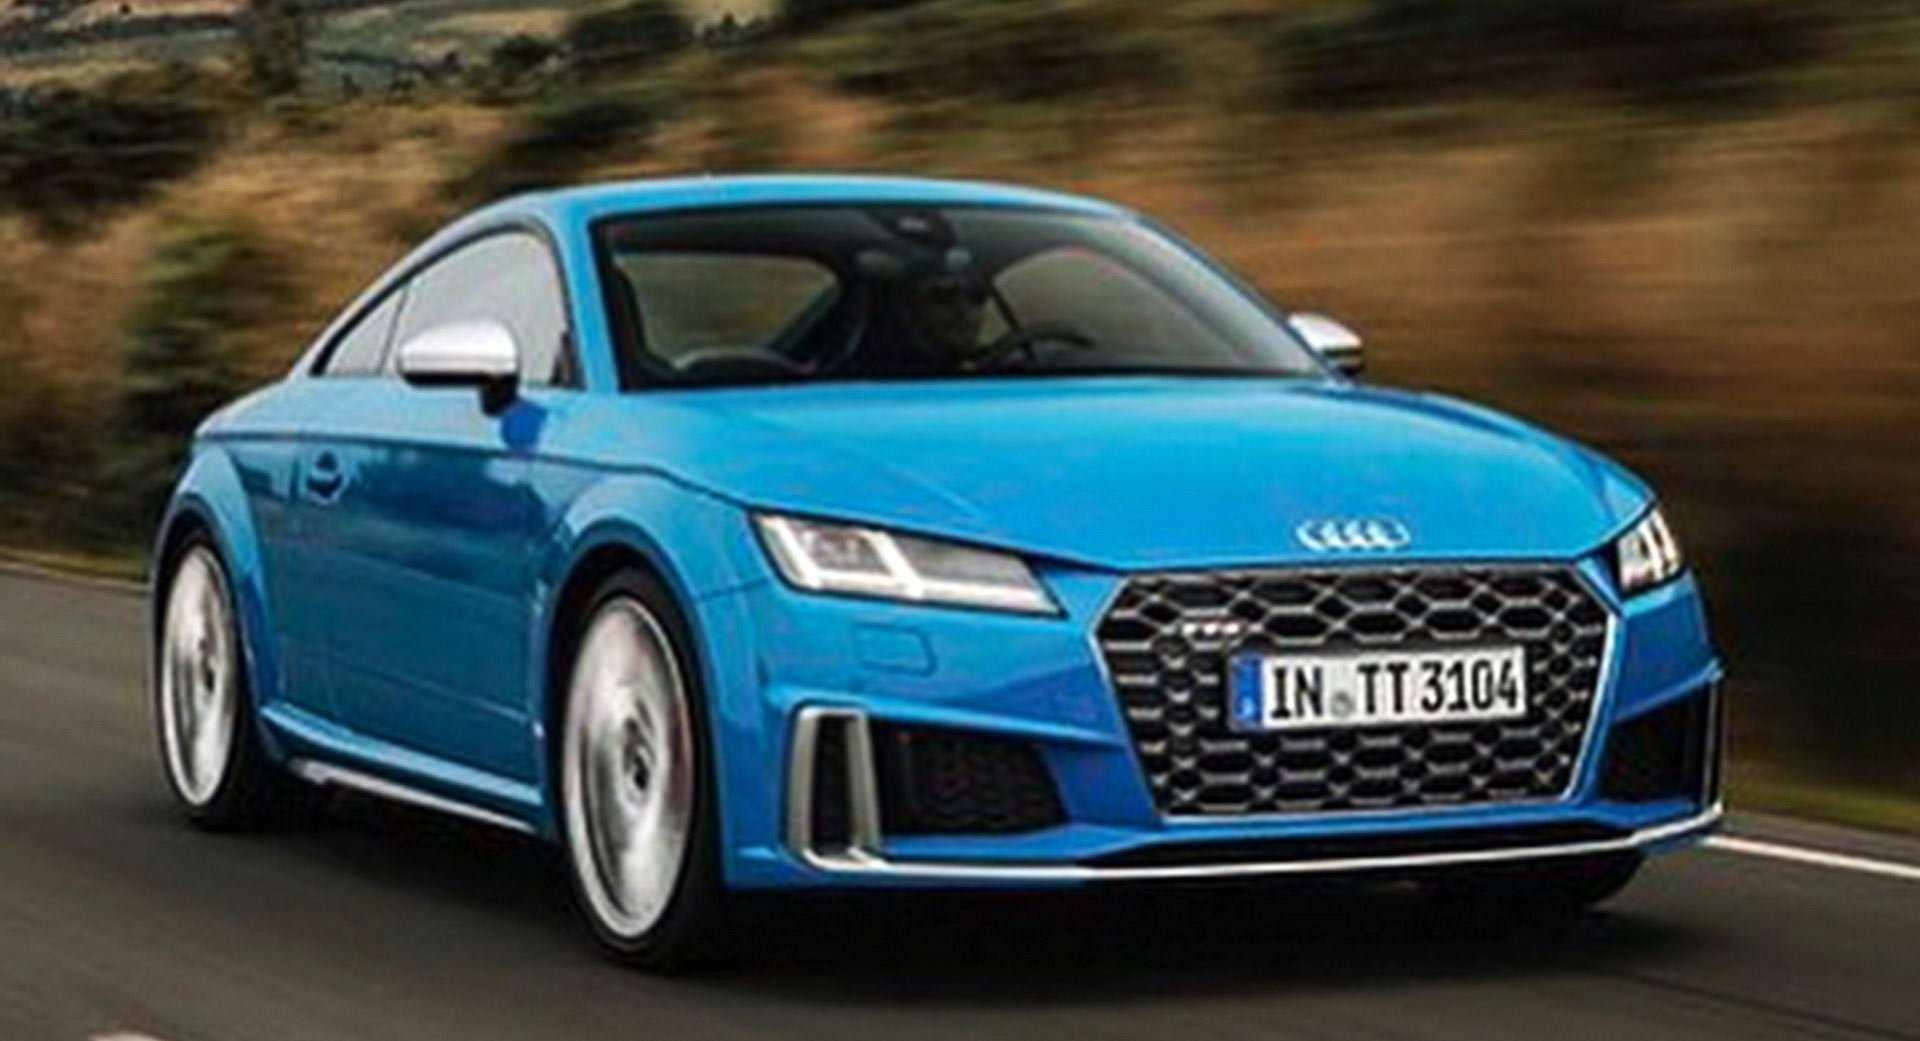 99 Gallery of 2019 Audi Tt Specs First Drive by 2019 Audi Tt Specs